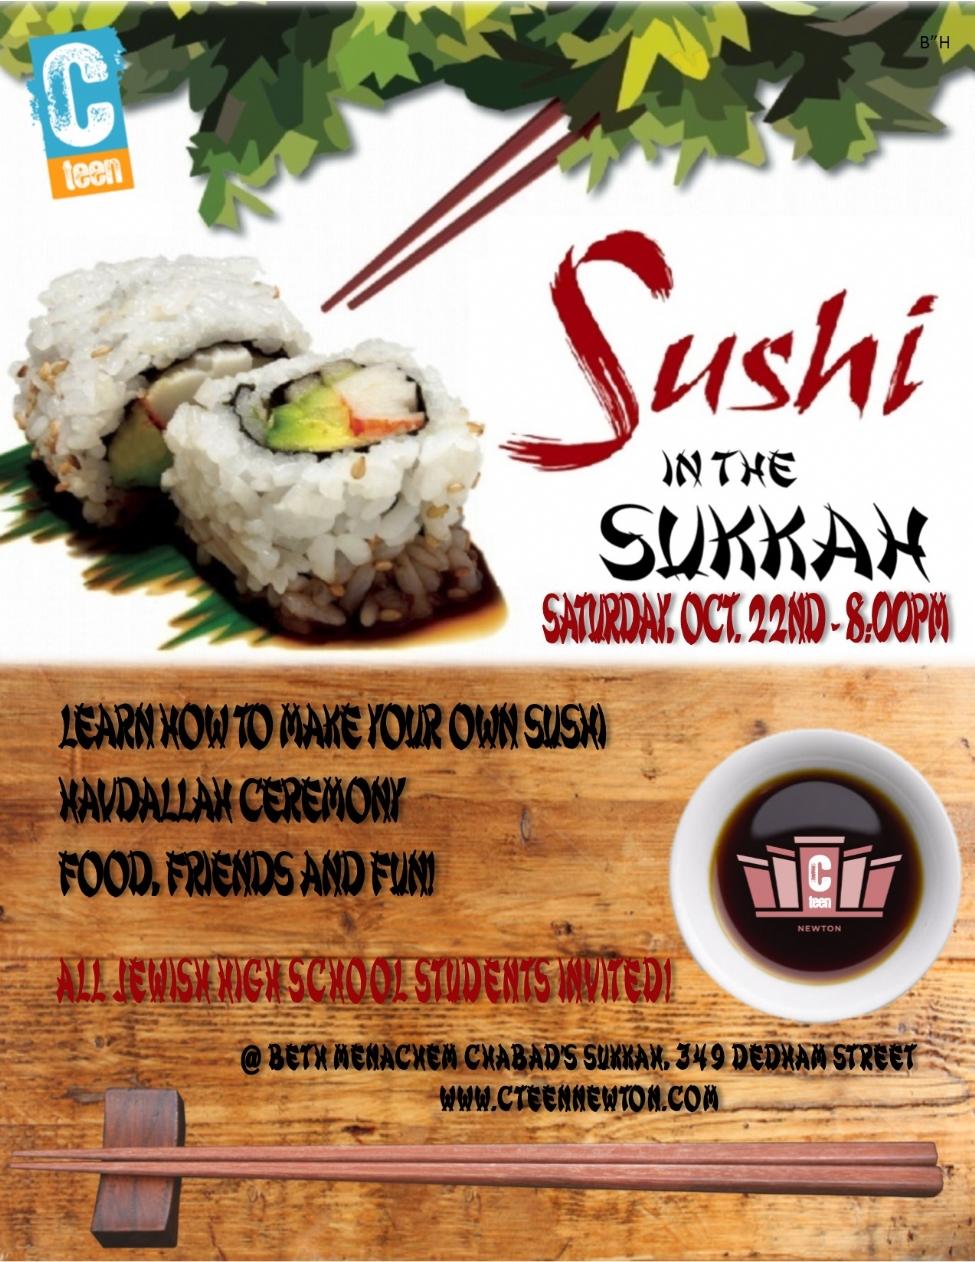 cteen sushi in the sukkah